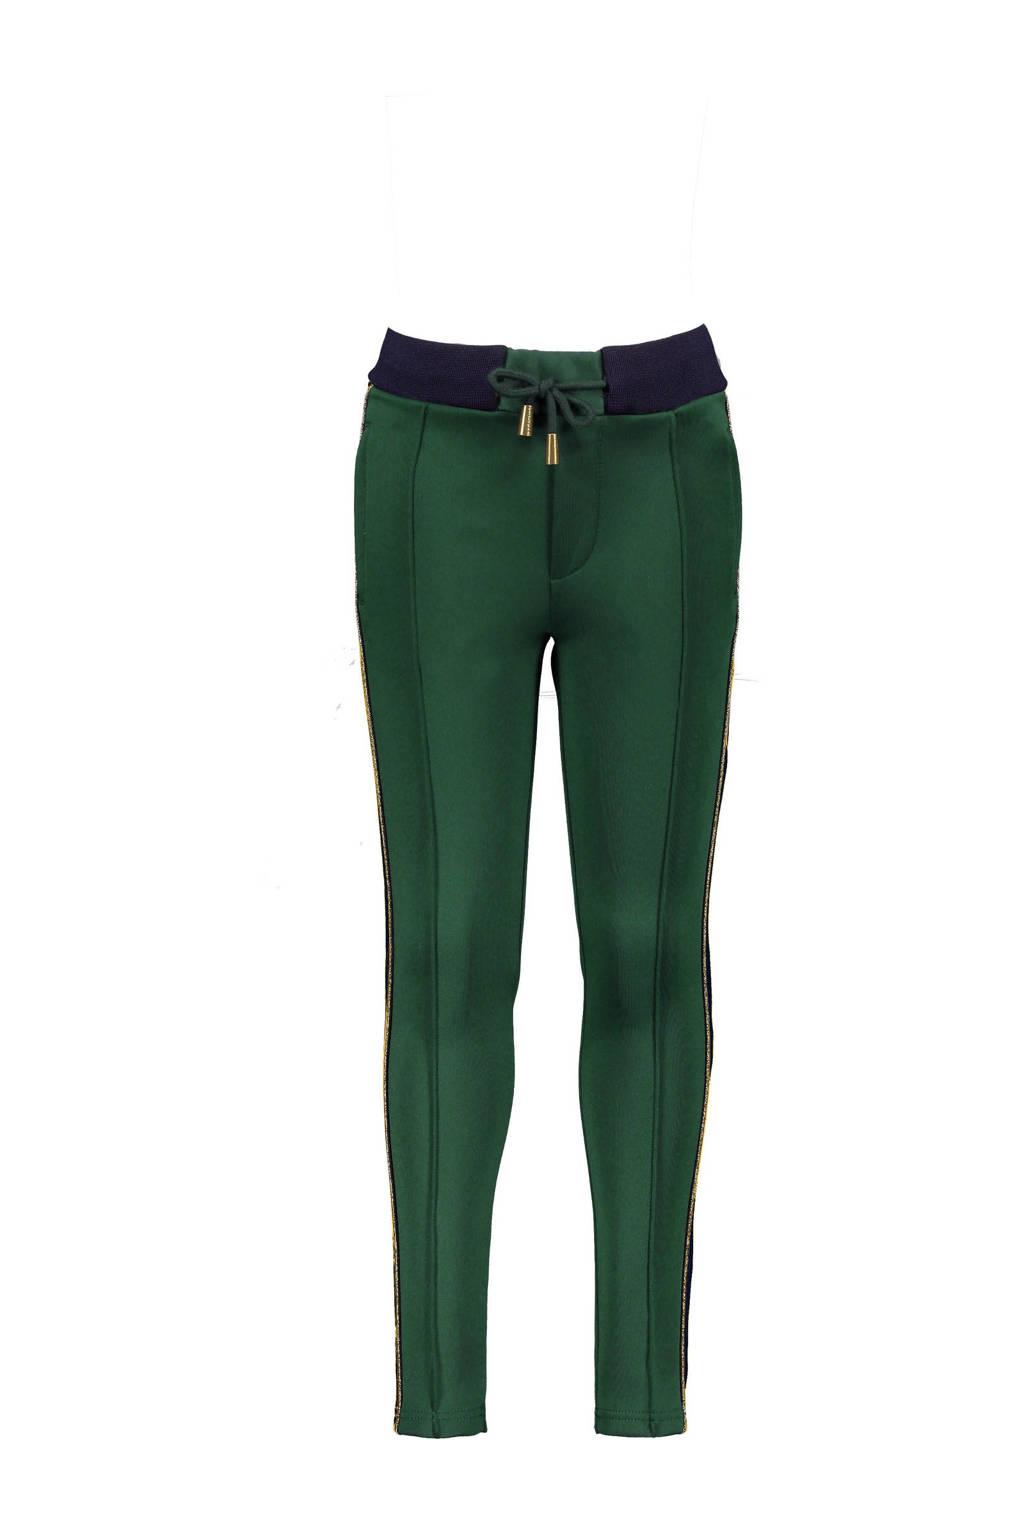 NoBell' tapered fit broek SeclerB met zijstreep donkergroen/donkerblauw, Donkergroen/donkerblauw